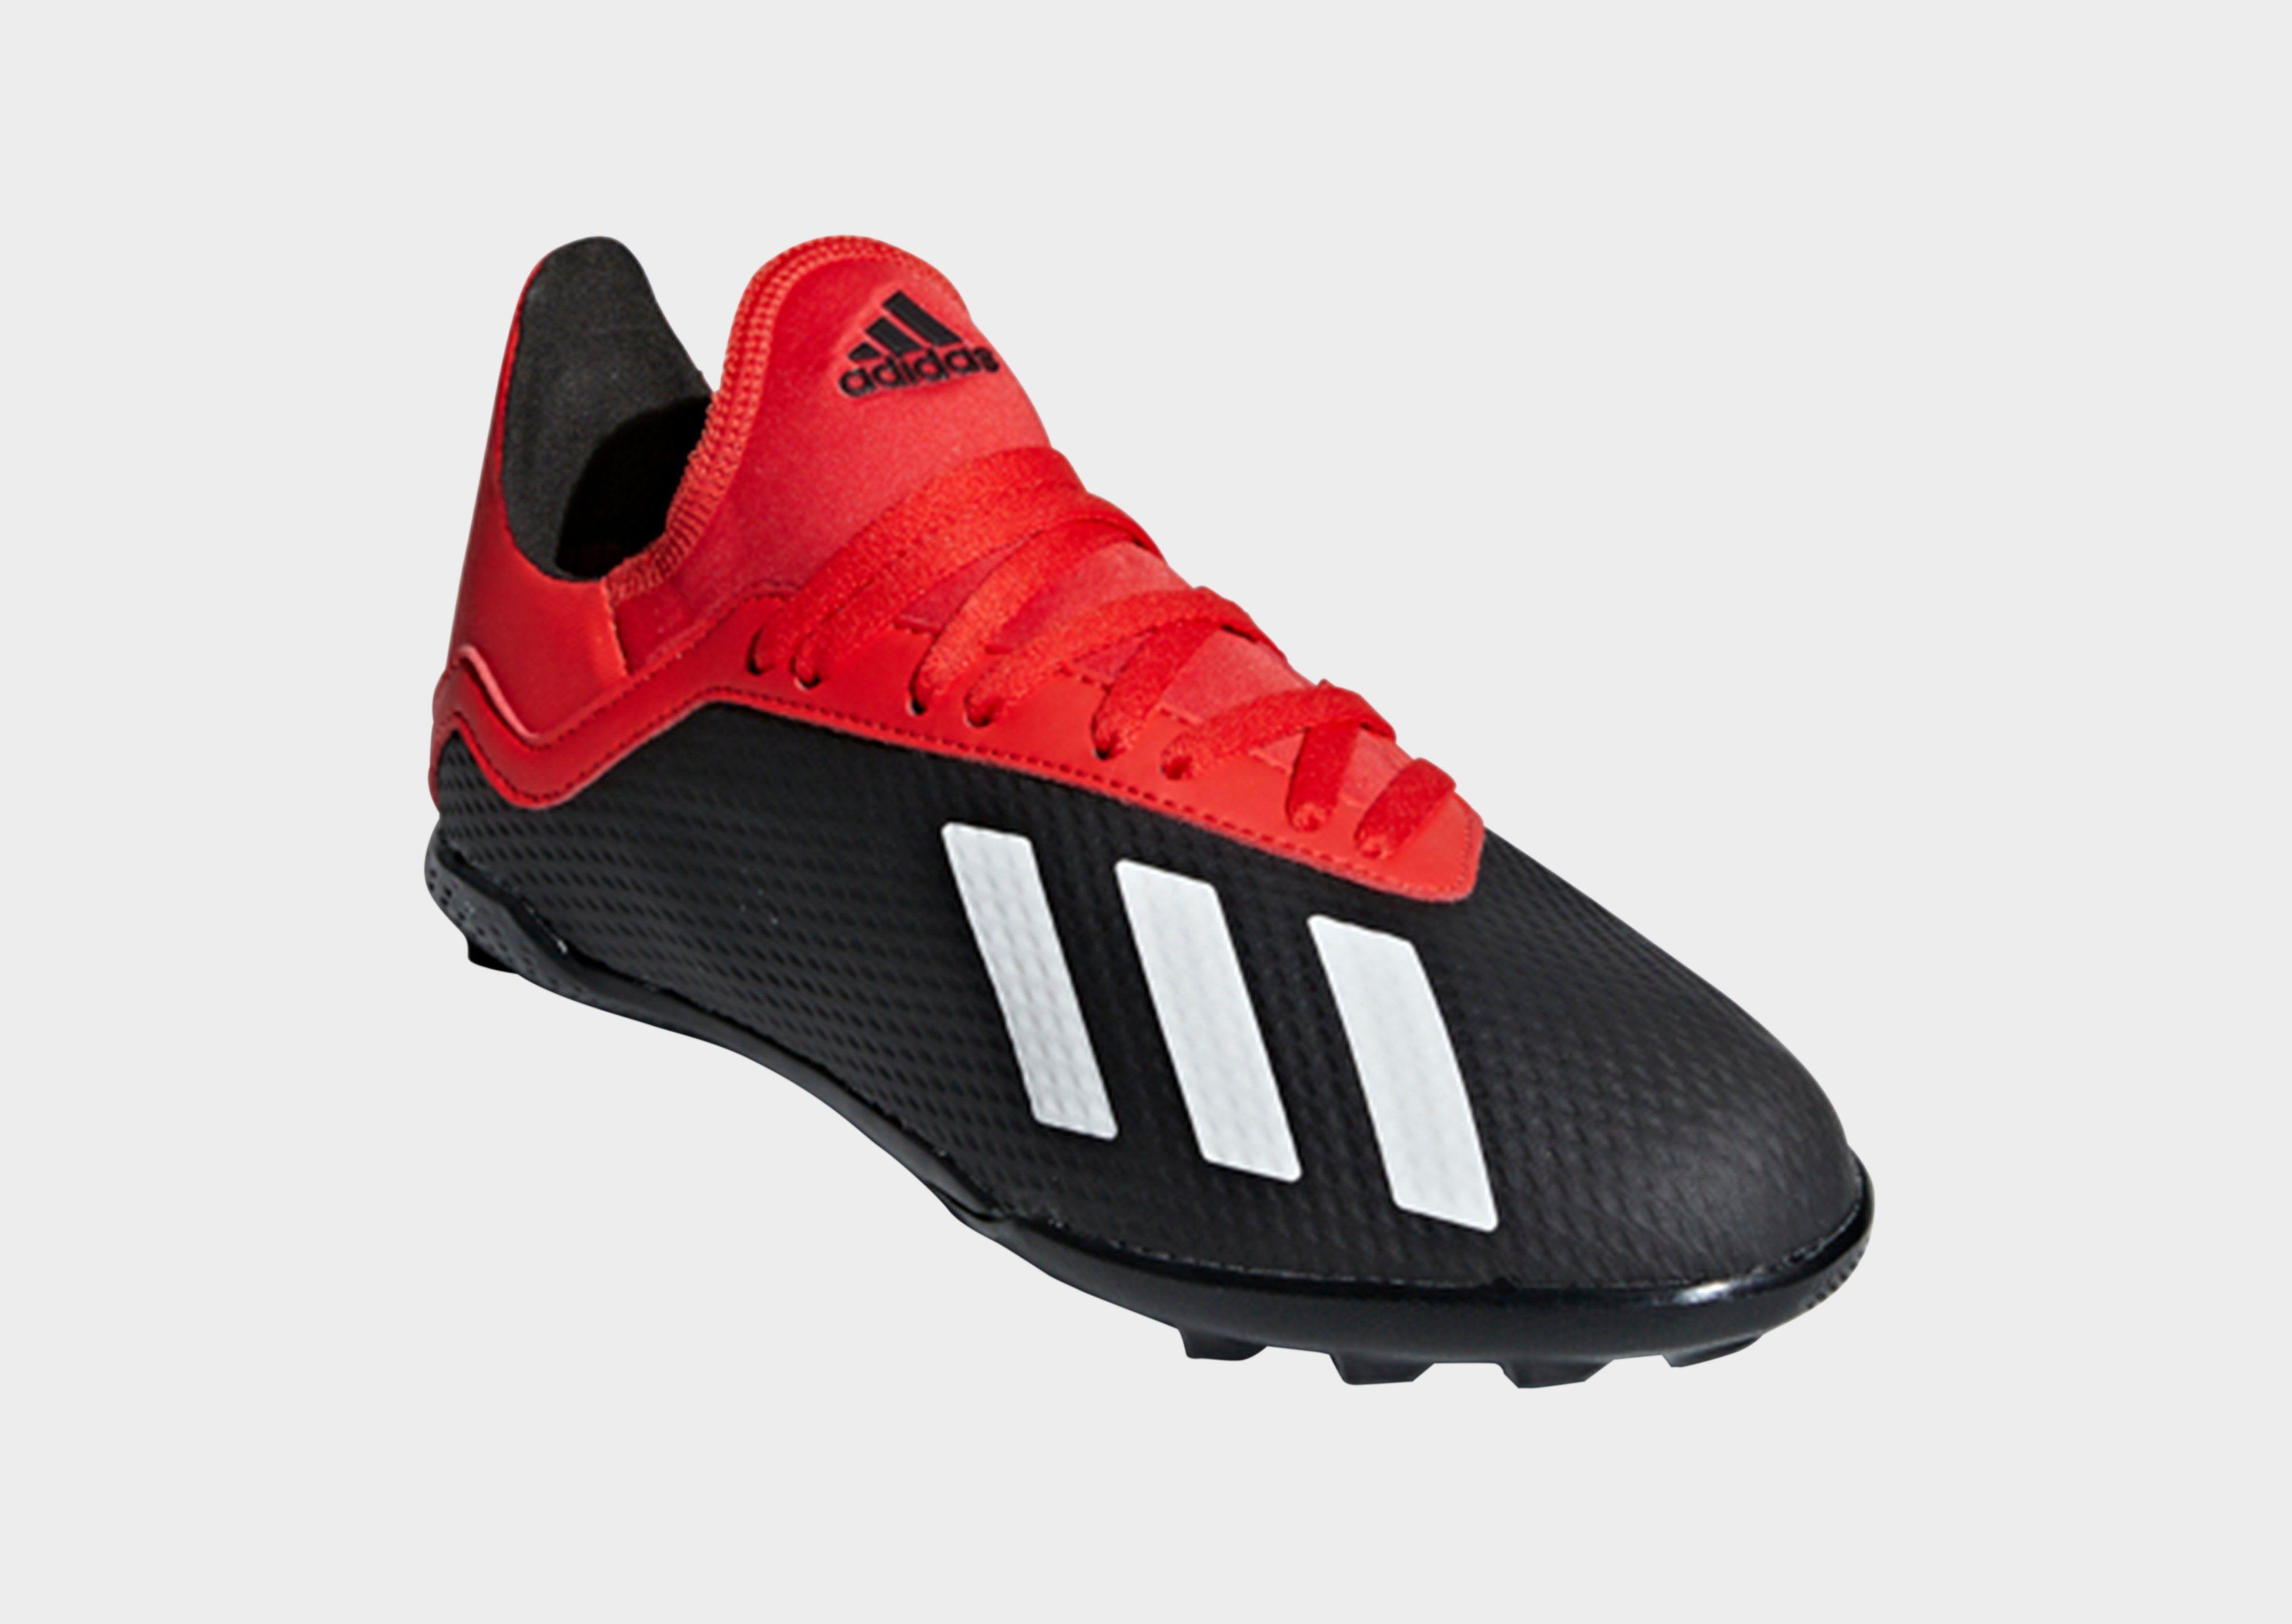 bdefbddd9 ADIDAS X Tango 18.3 Turf Boots